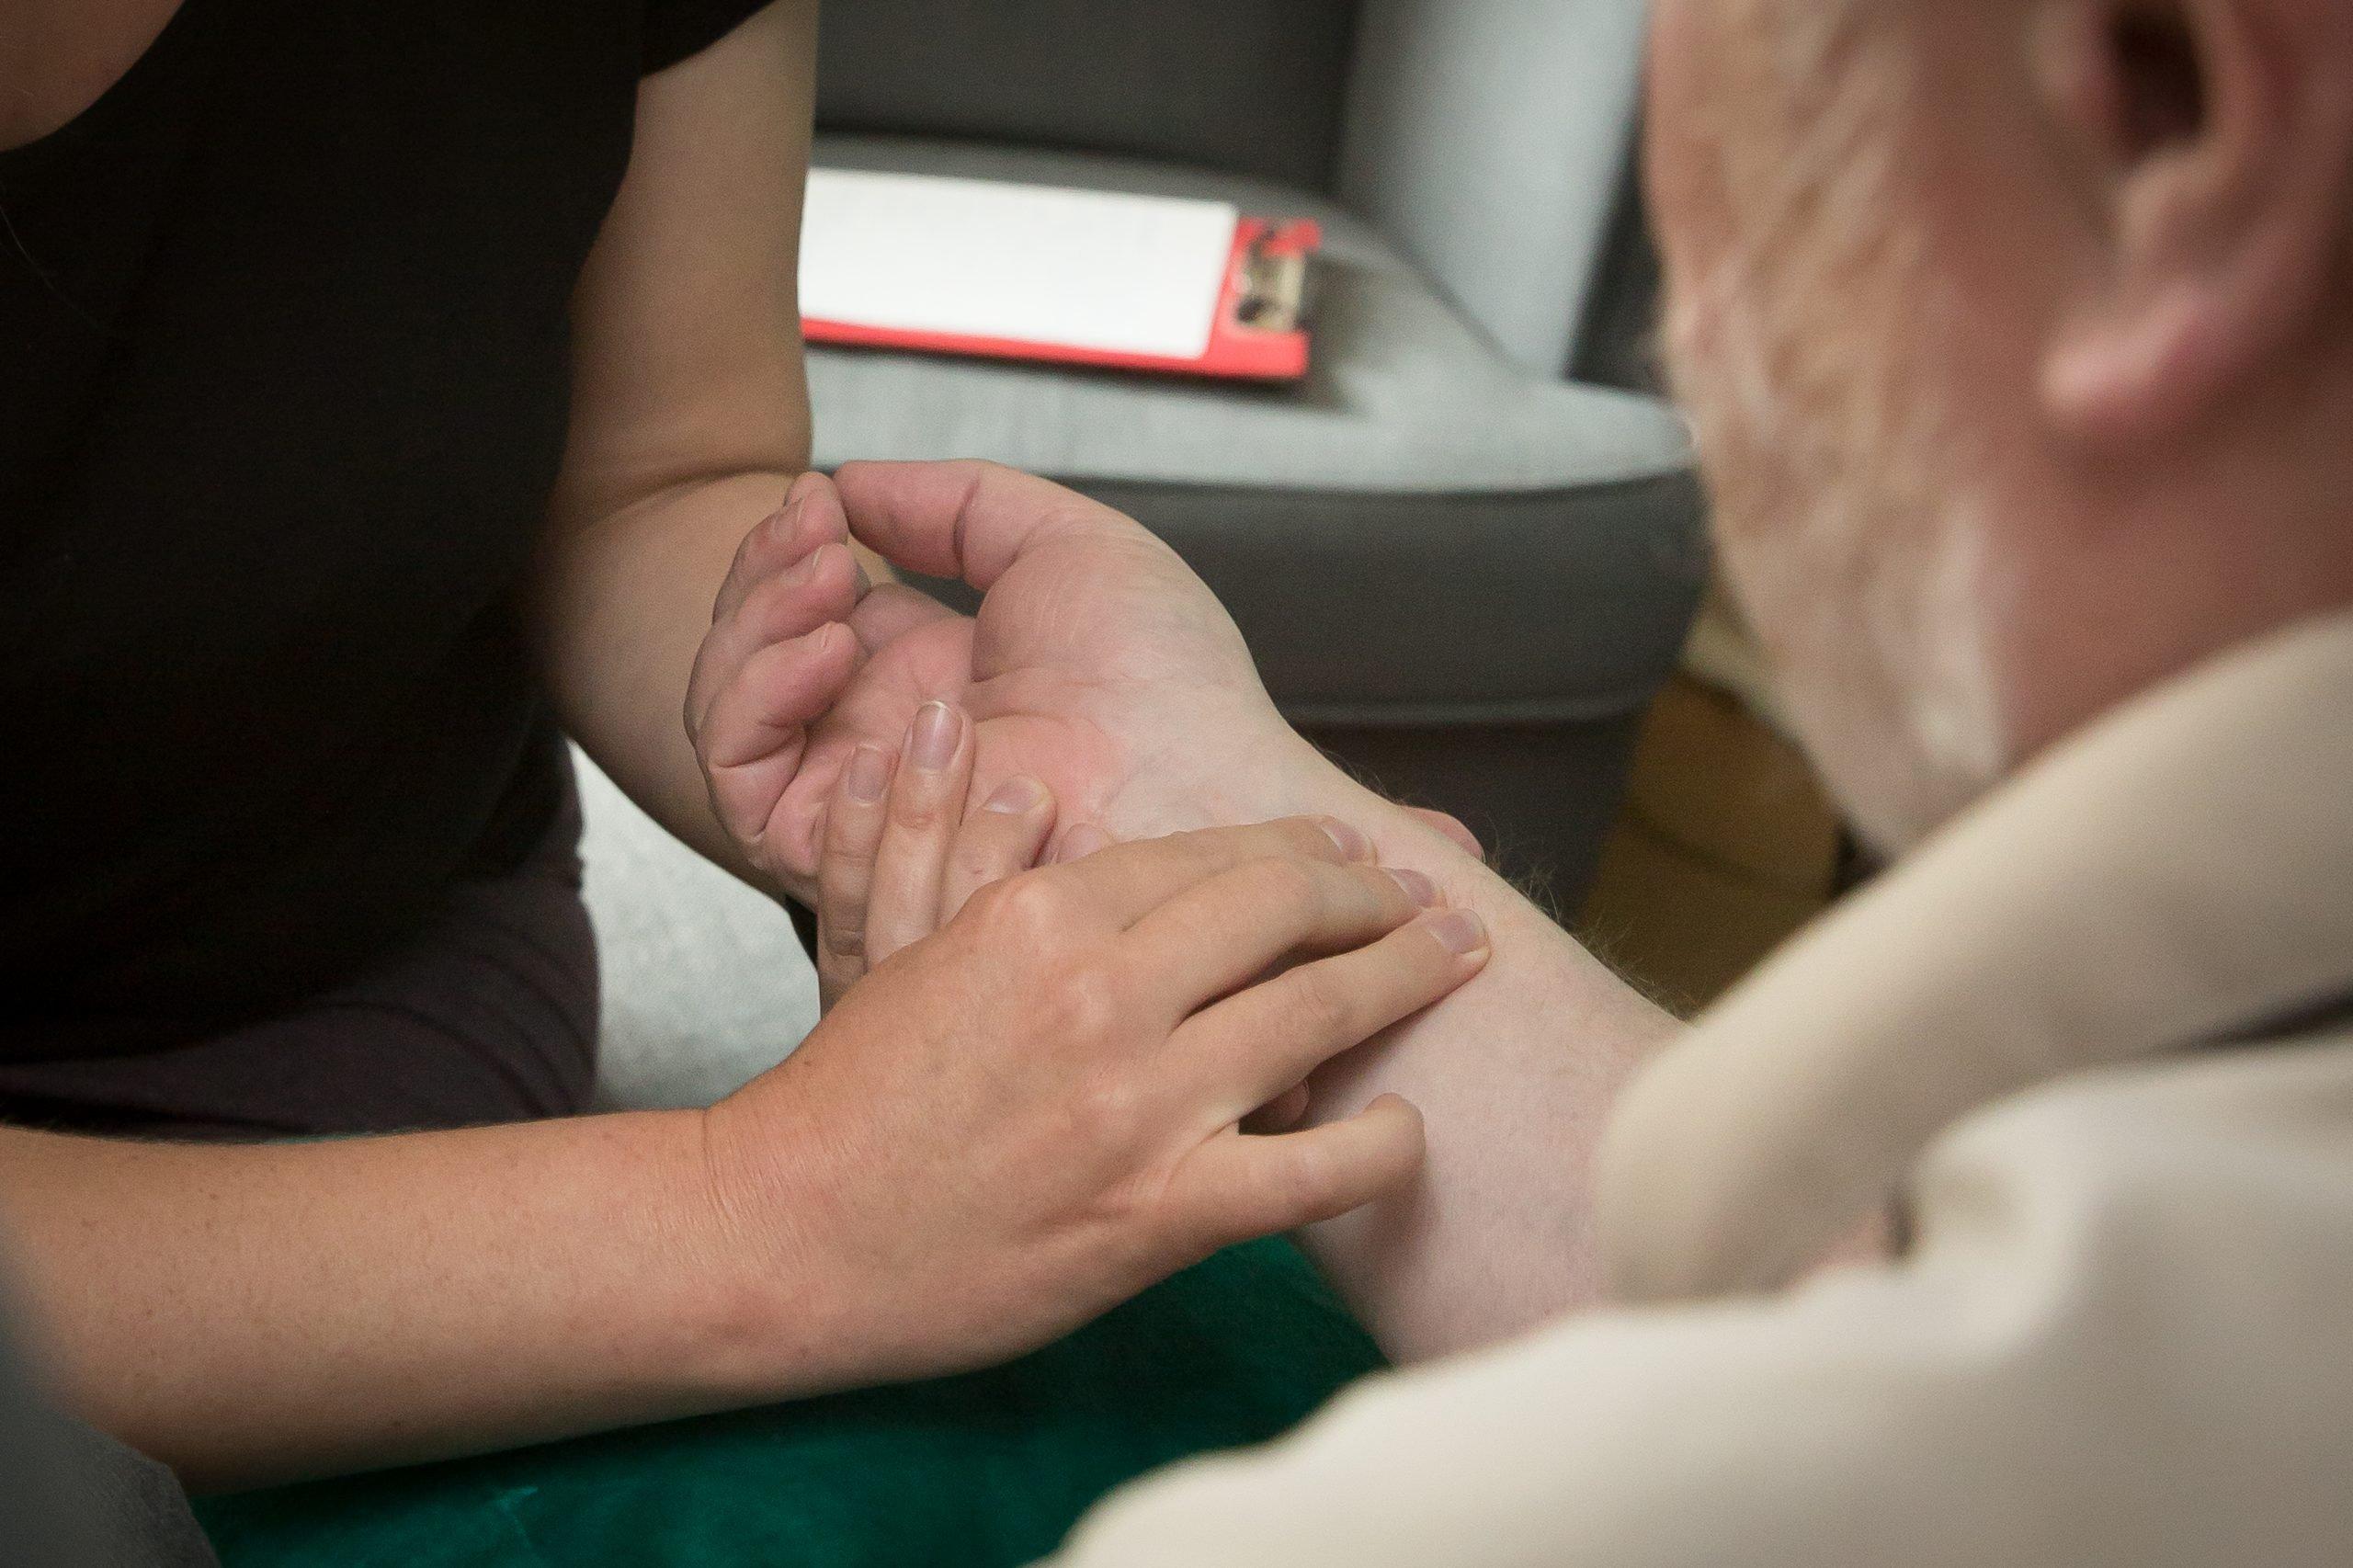 Practicing pulse diagnosis